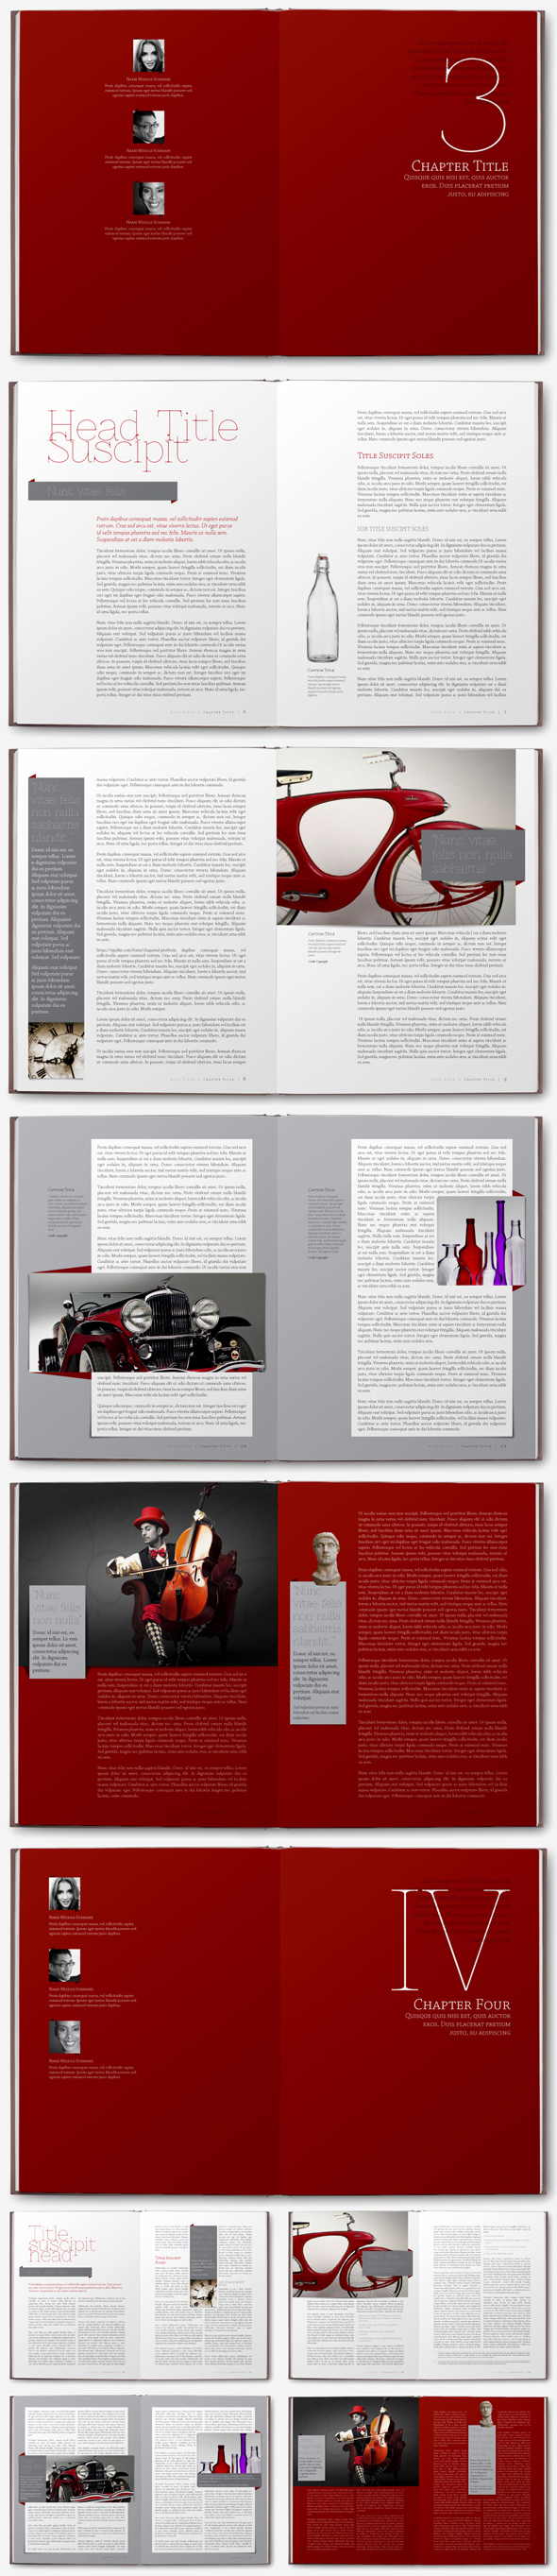 Book Templates on Behance